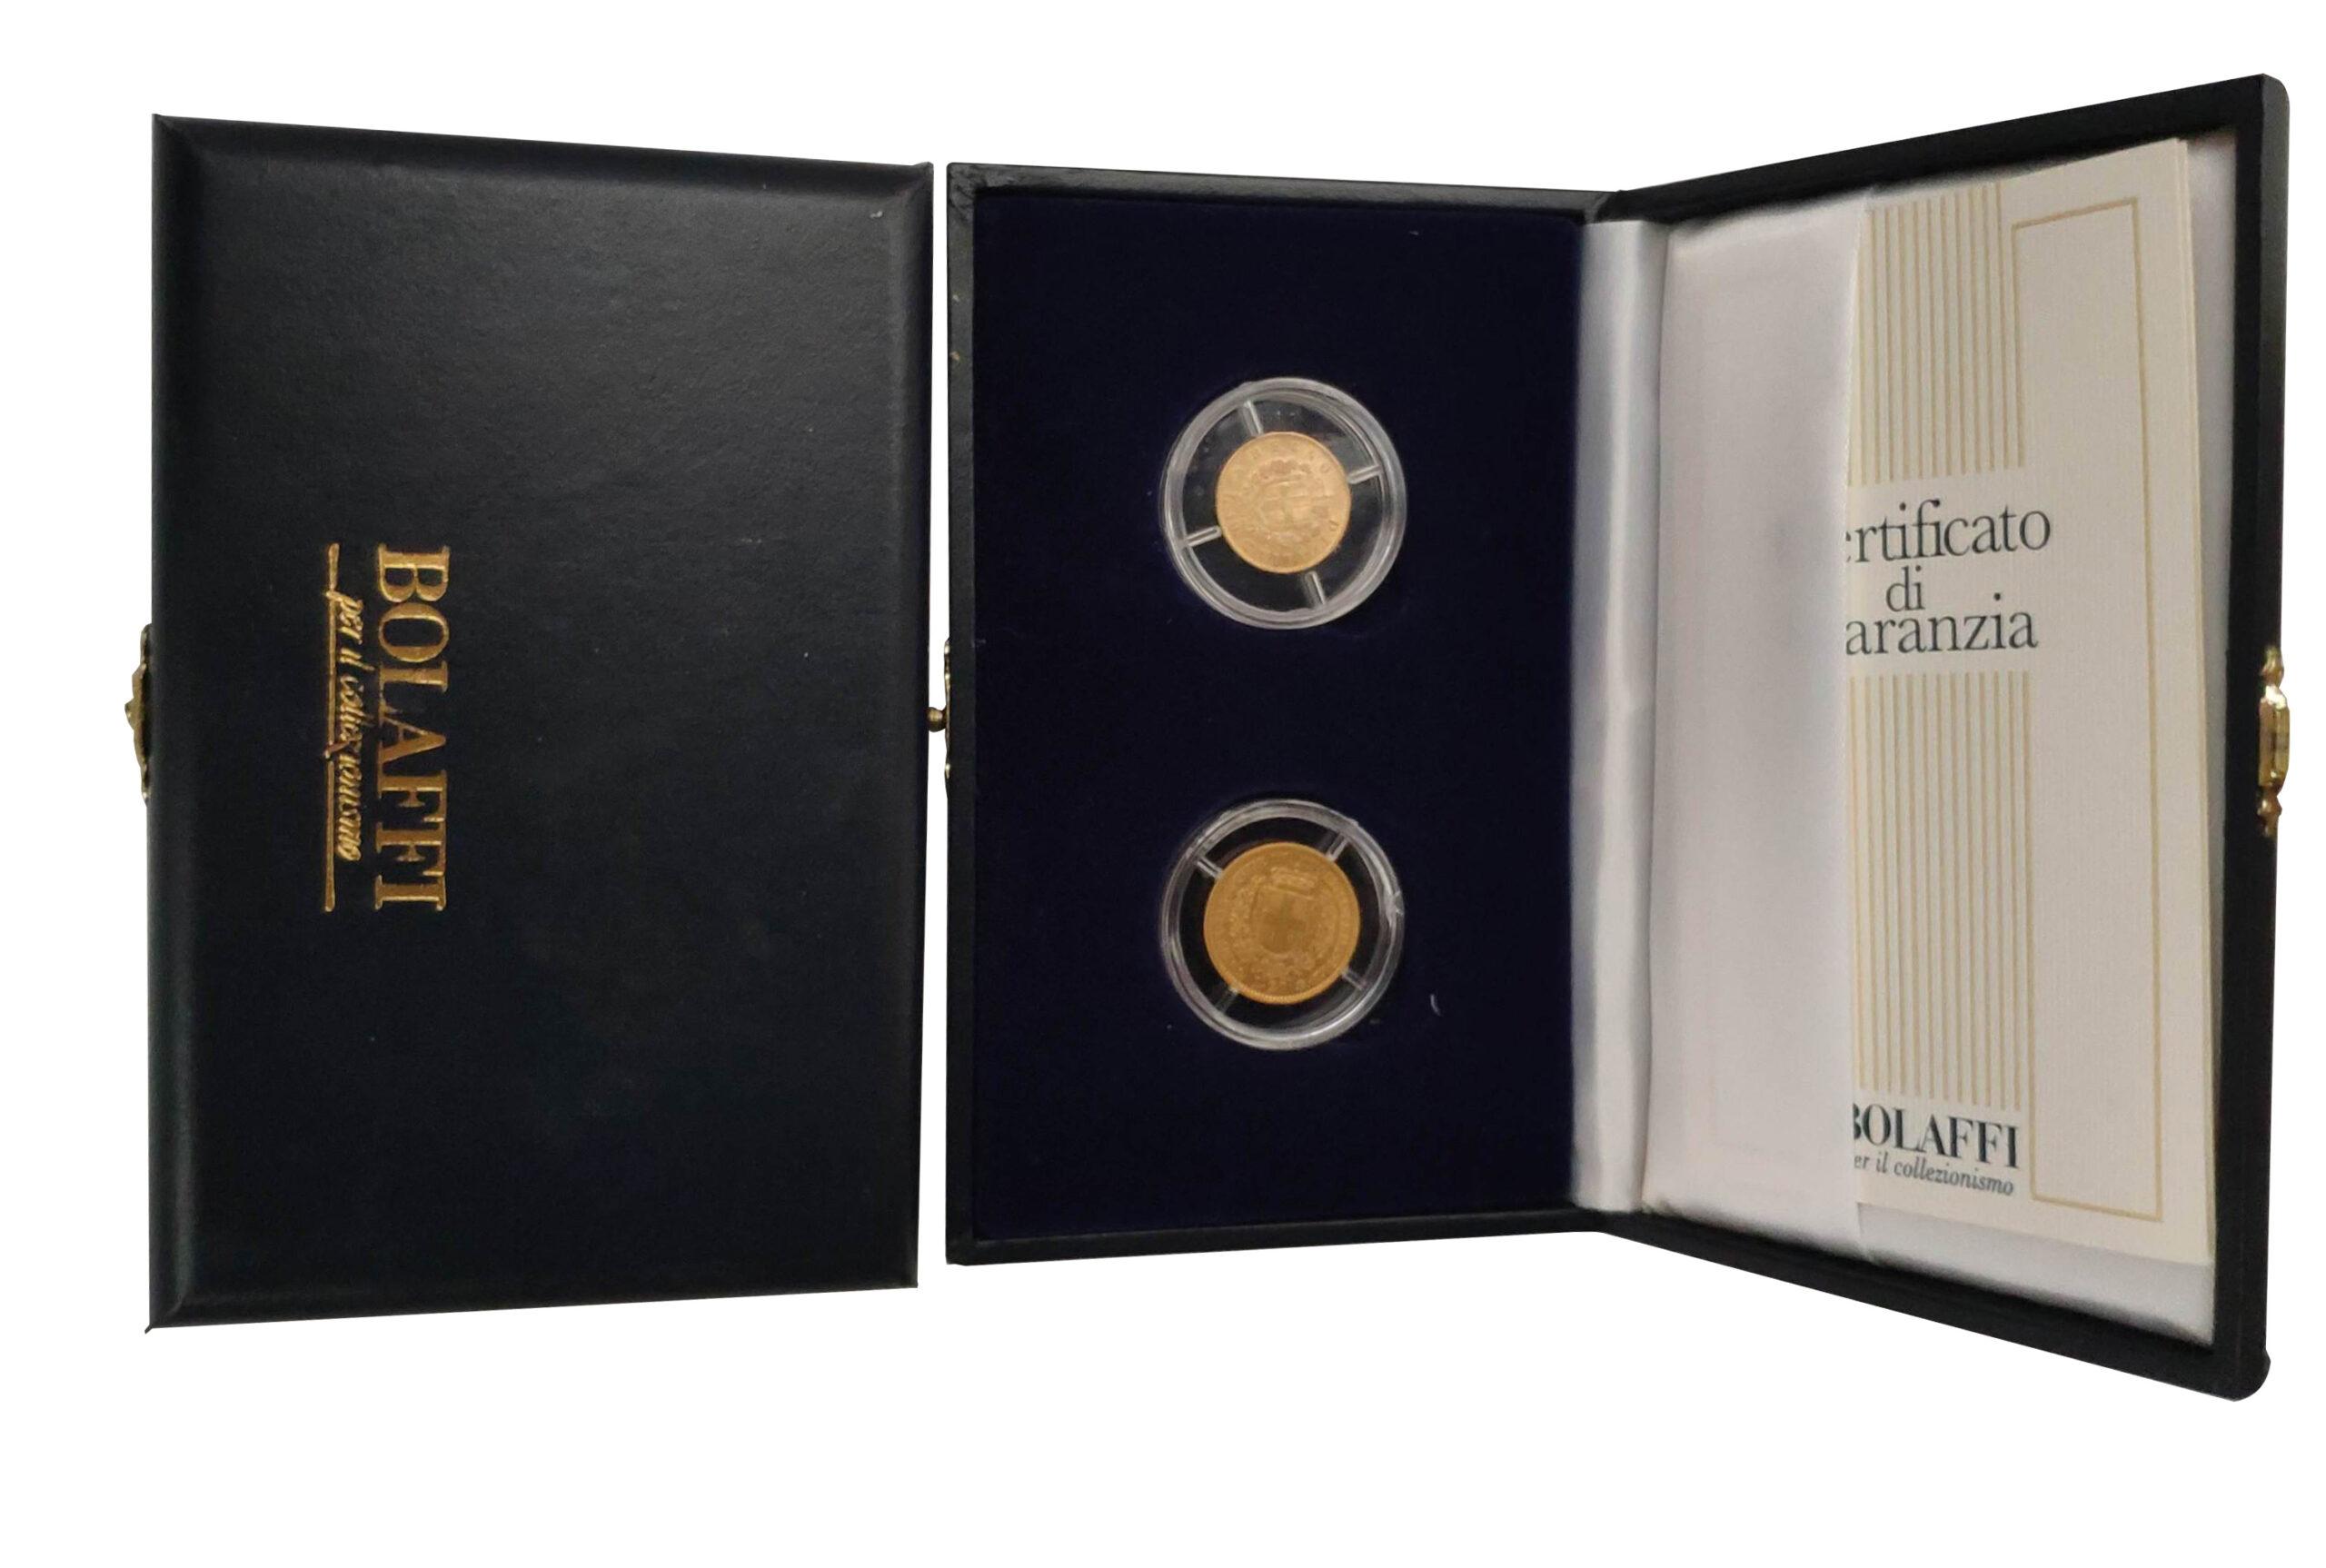 Bolaffi – La lira d'oro